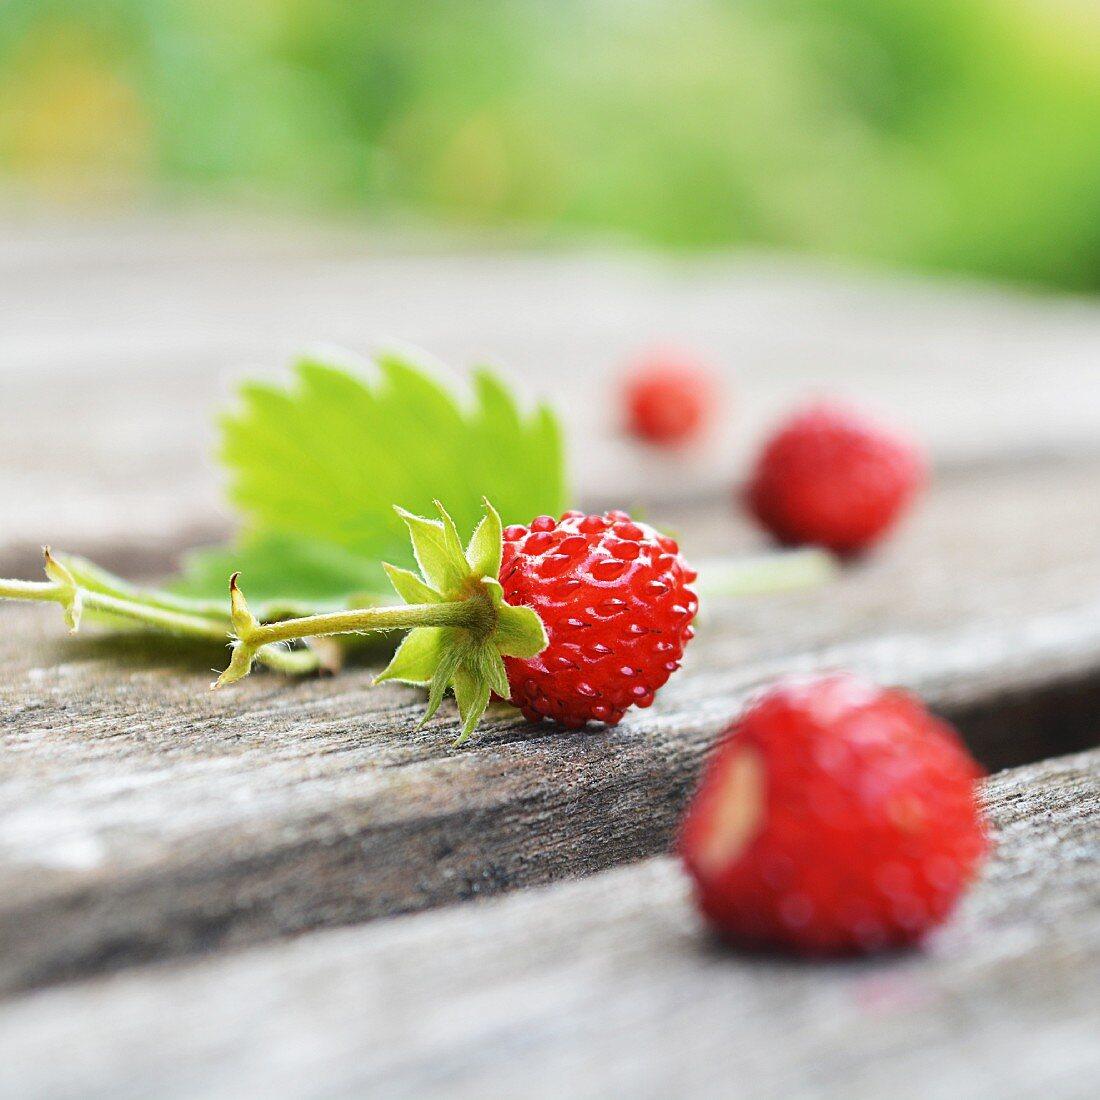 Wild strawberries on a garden table